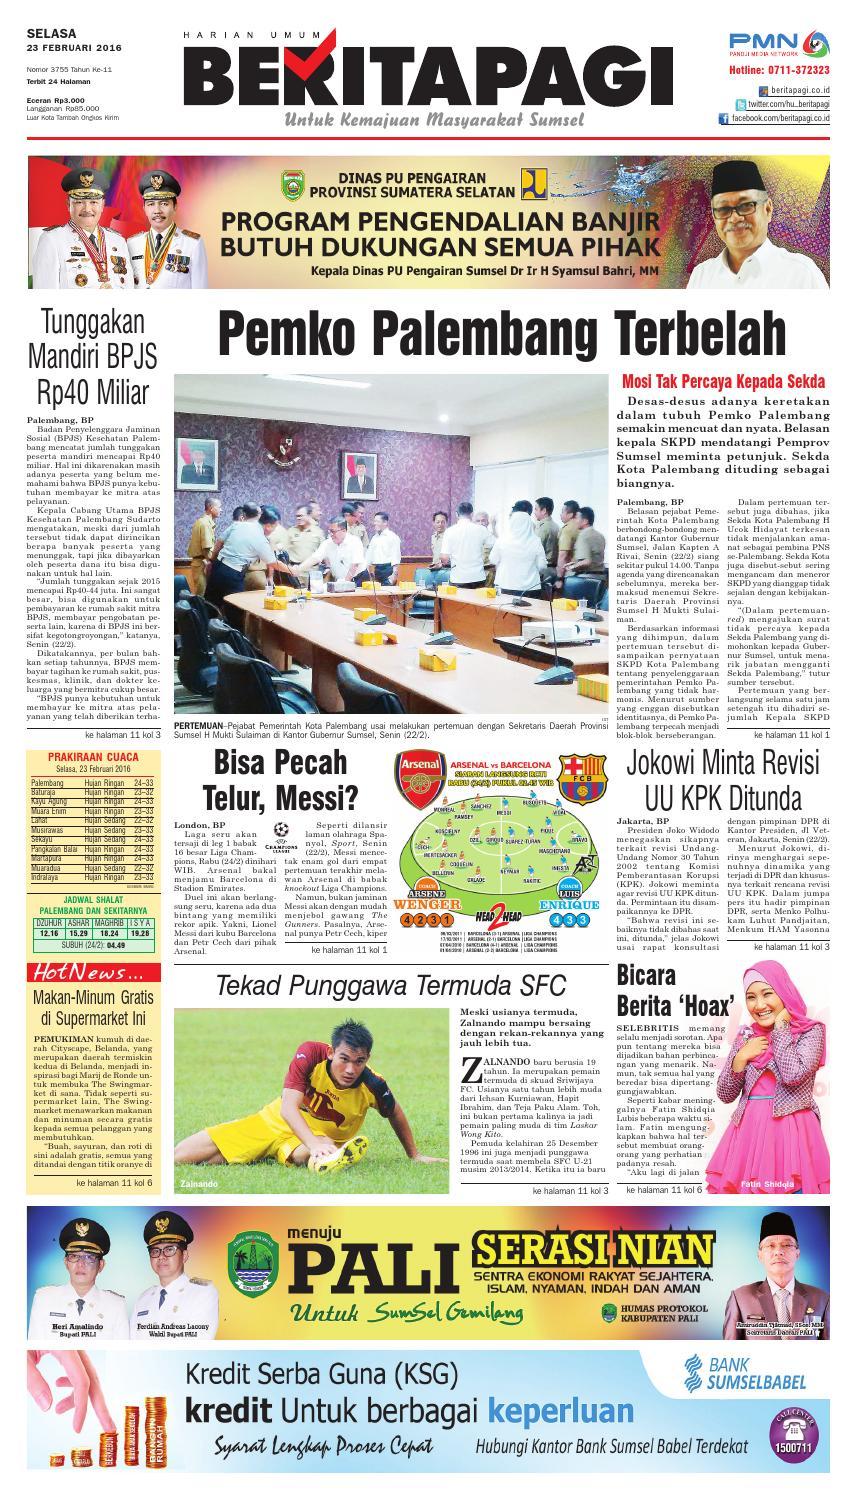 Selasa 23 Februari 2016 By Beritapagi Issuu Rkb Bni Tegal Kranjang Buah Nur Fashion And Art